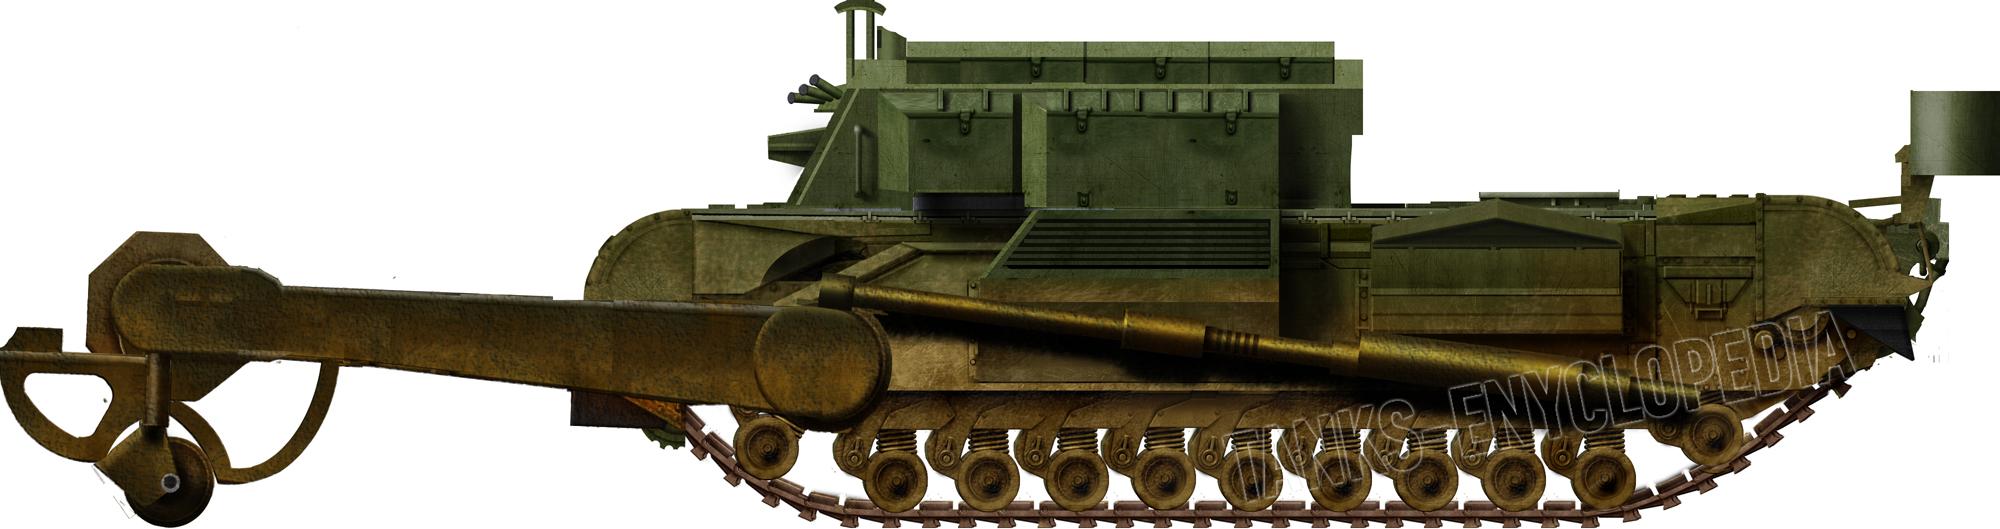 Churchill Toad, FV3902 Flail Tank